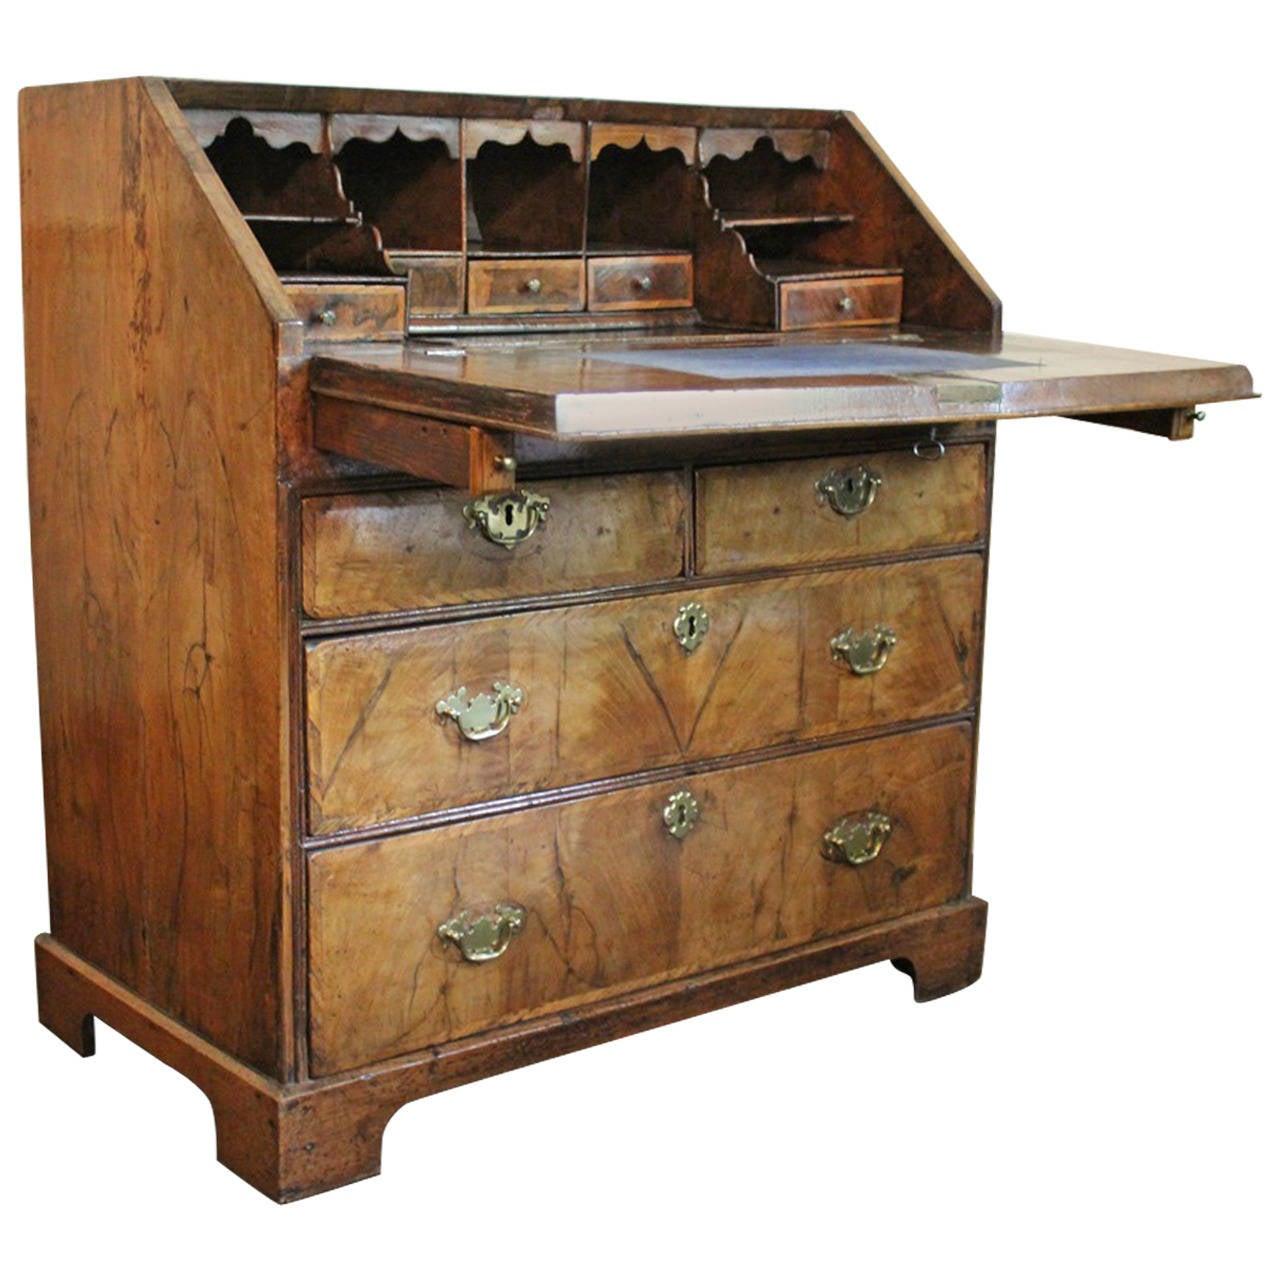 early 18th century english george i walnut bureau at 1stdibs. Black Bedroom Furniture Sets. Home Design Ideas